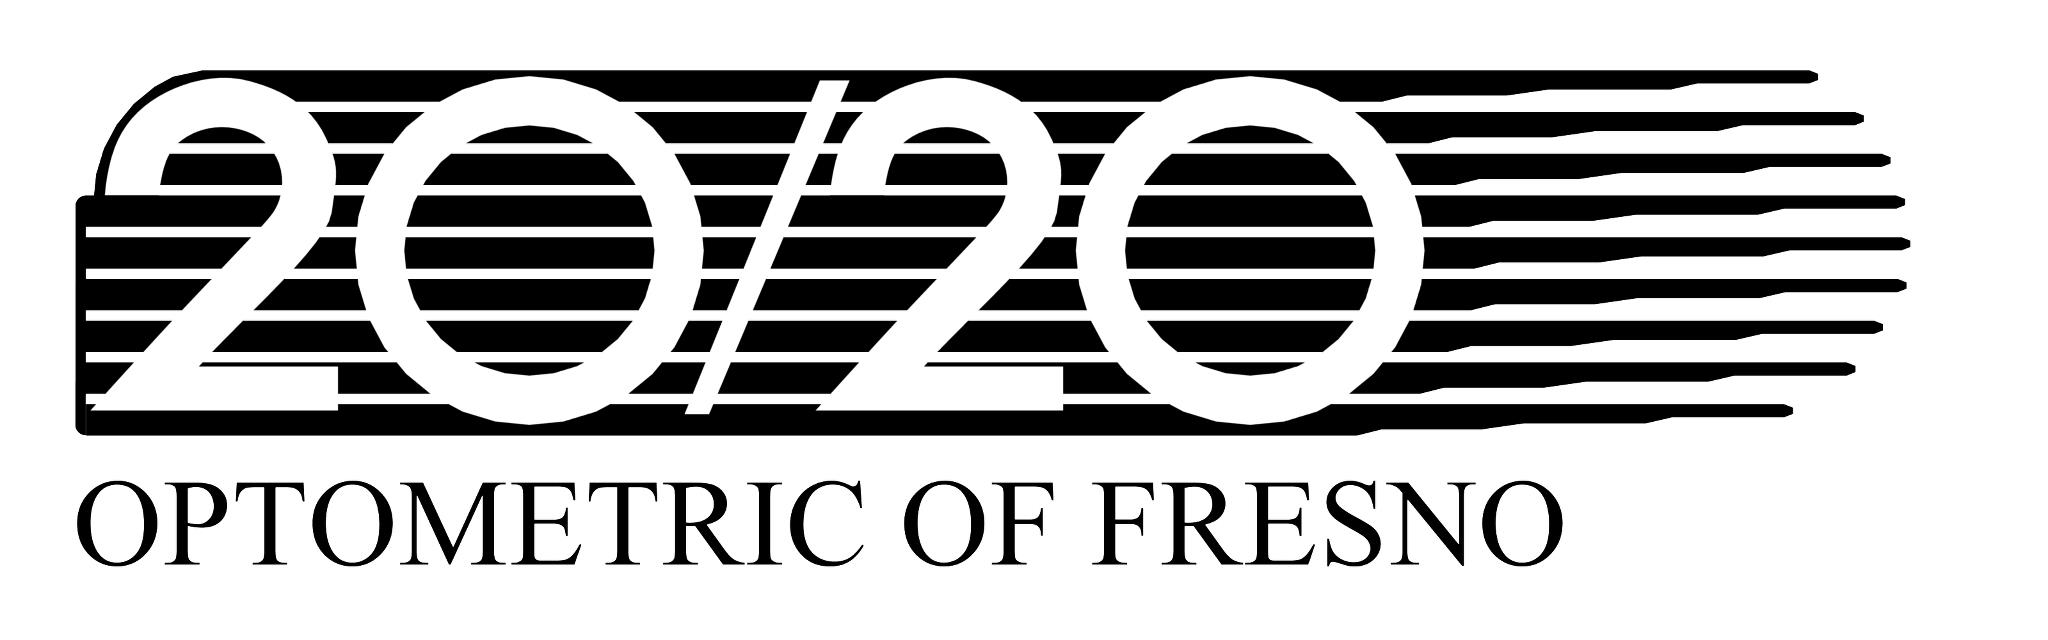 20/20 Optometric of Fresno - ad image